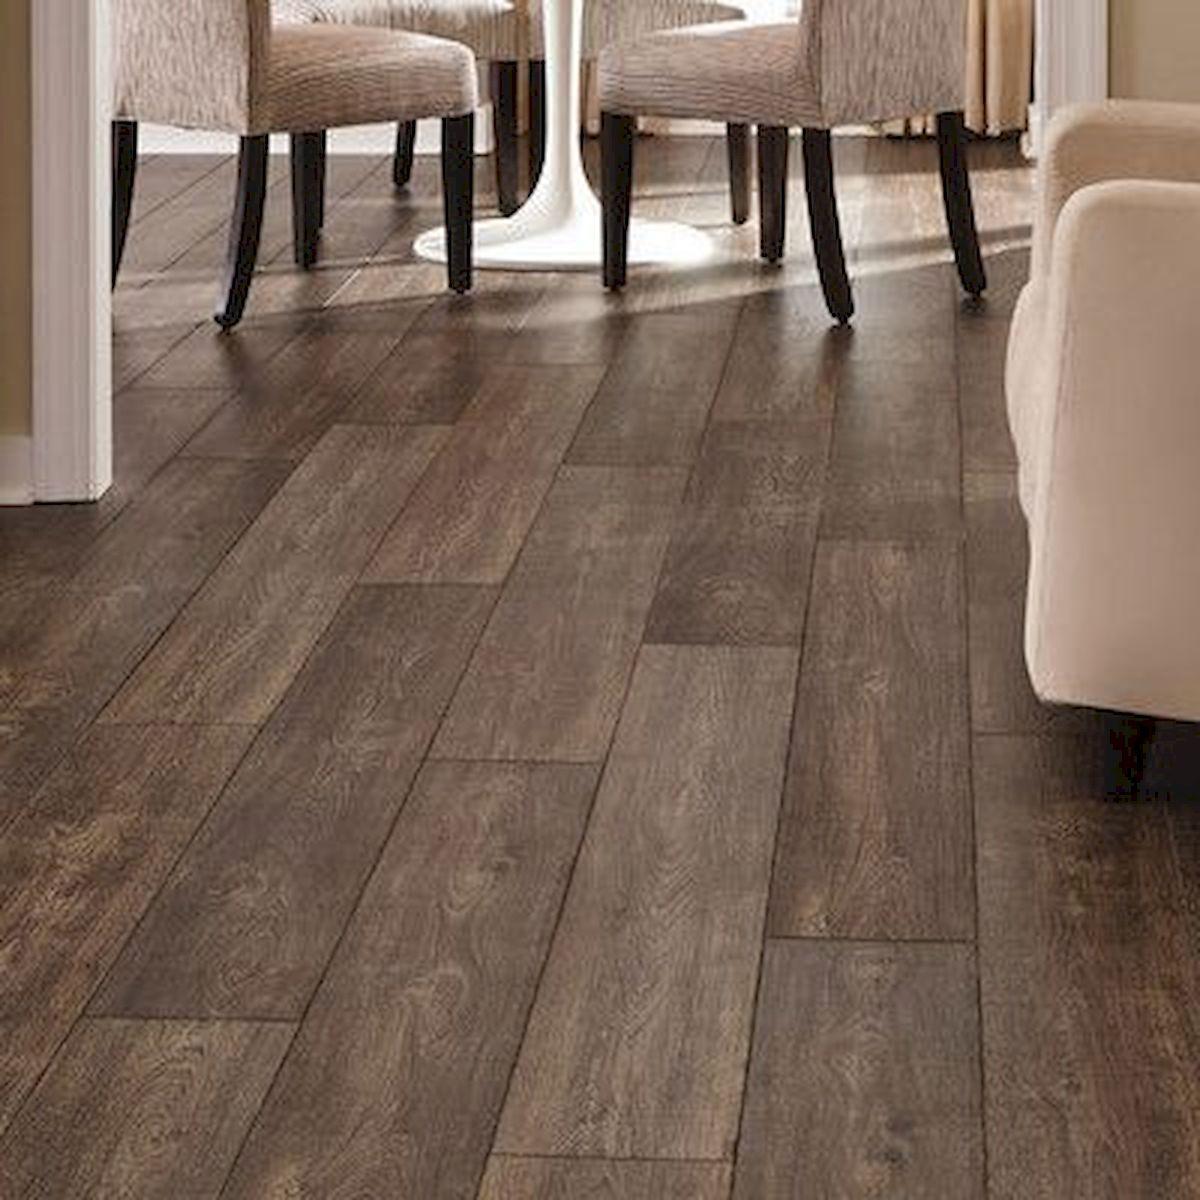 80 Gorgeous Hardwood Floor Ideas for Interior Home (57)